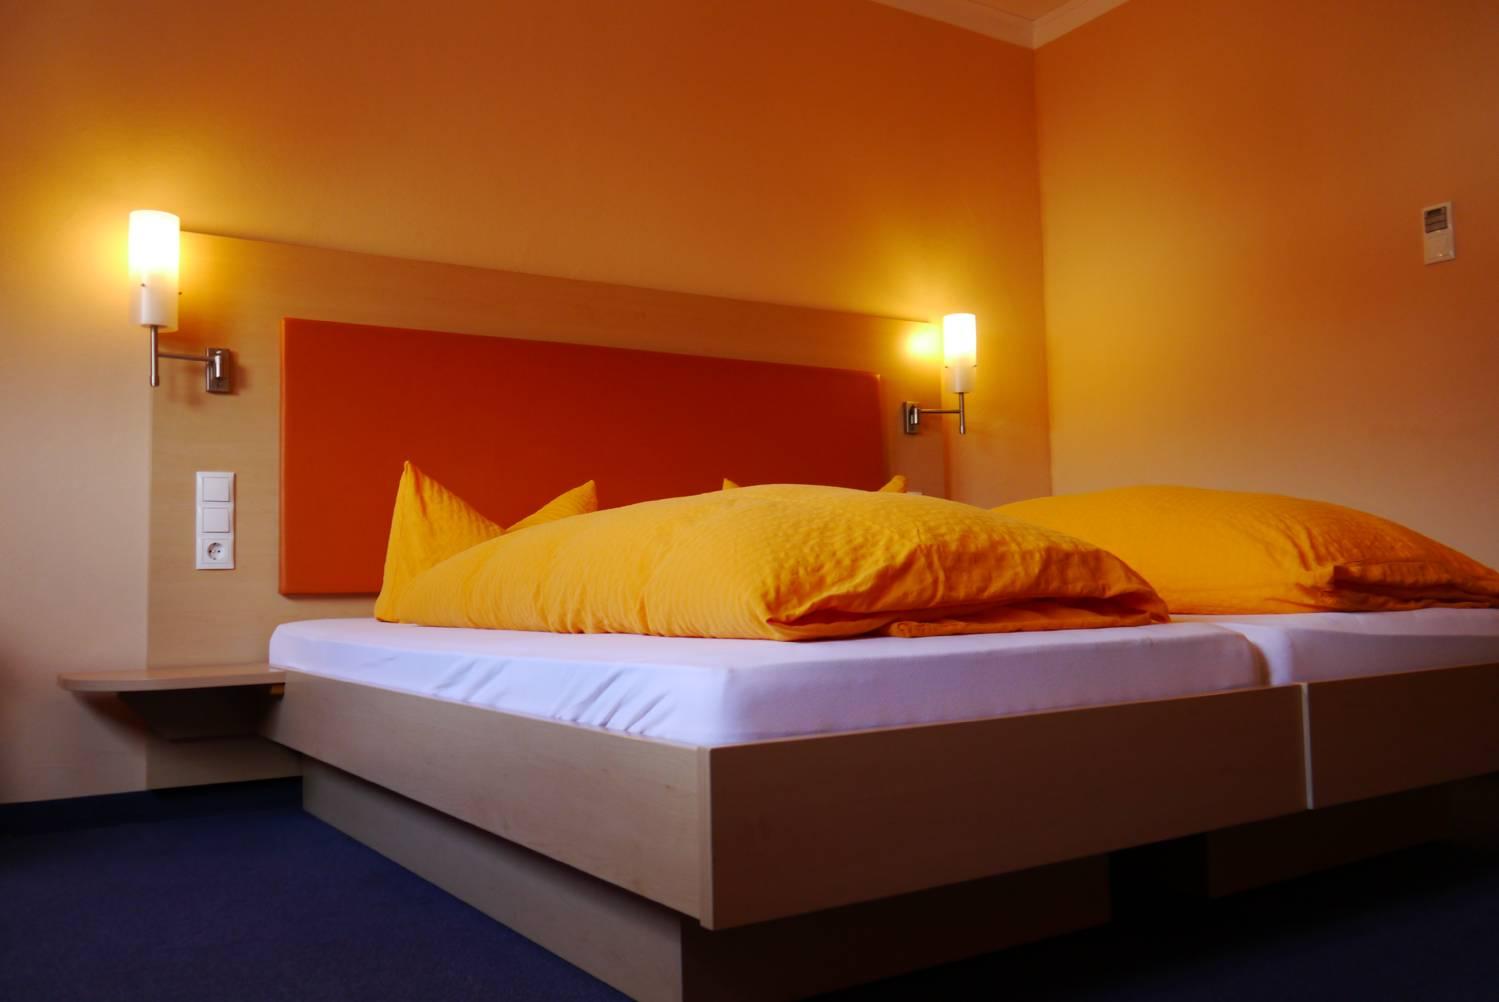 Restaurant molino hotel zur linde silz www pfal